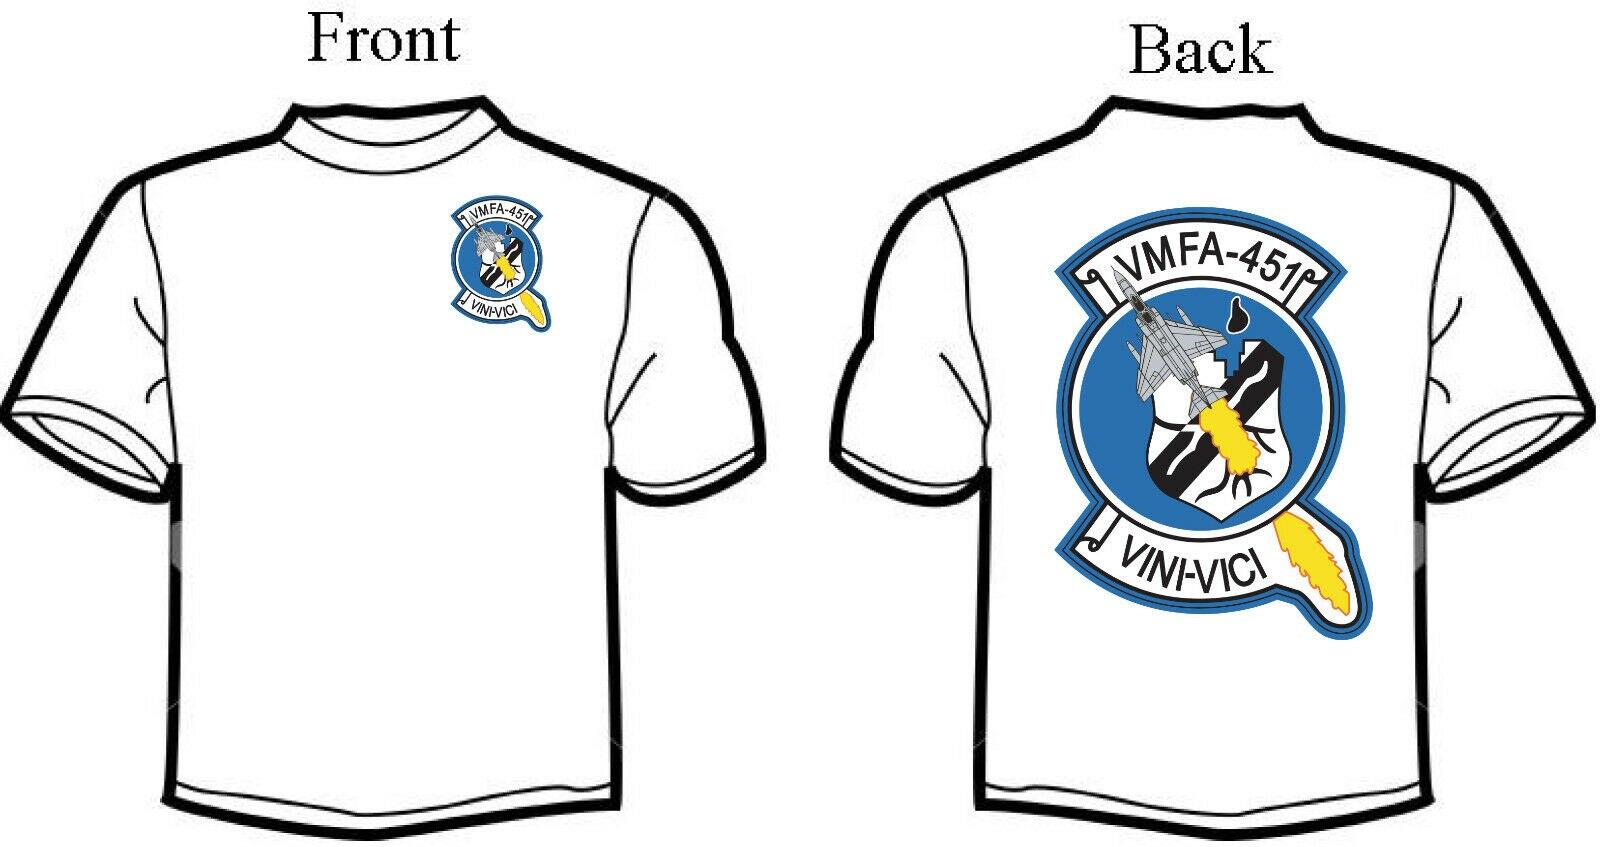 Vmfa 451 caudillos F 4 escuadrón fantasma T camisa